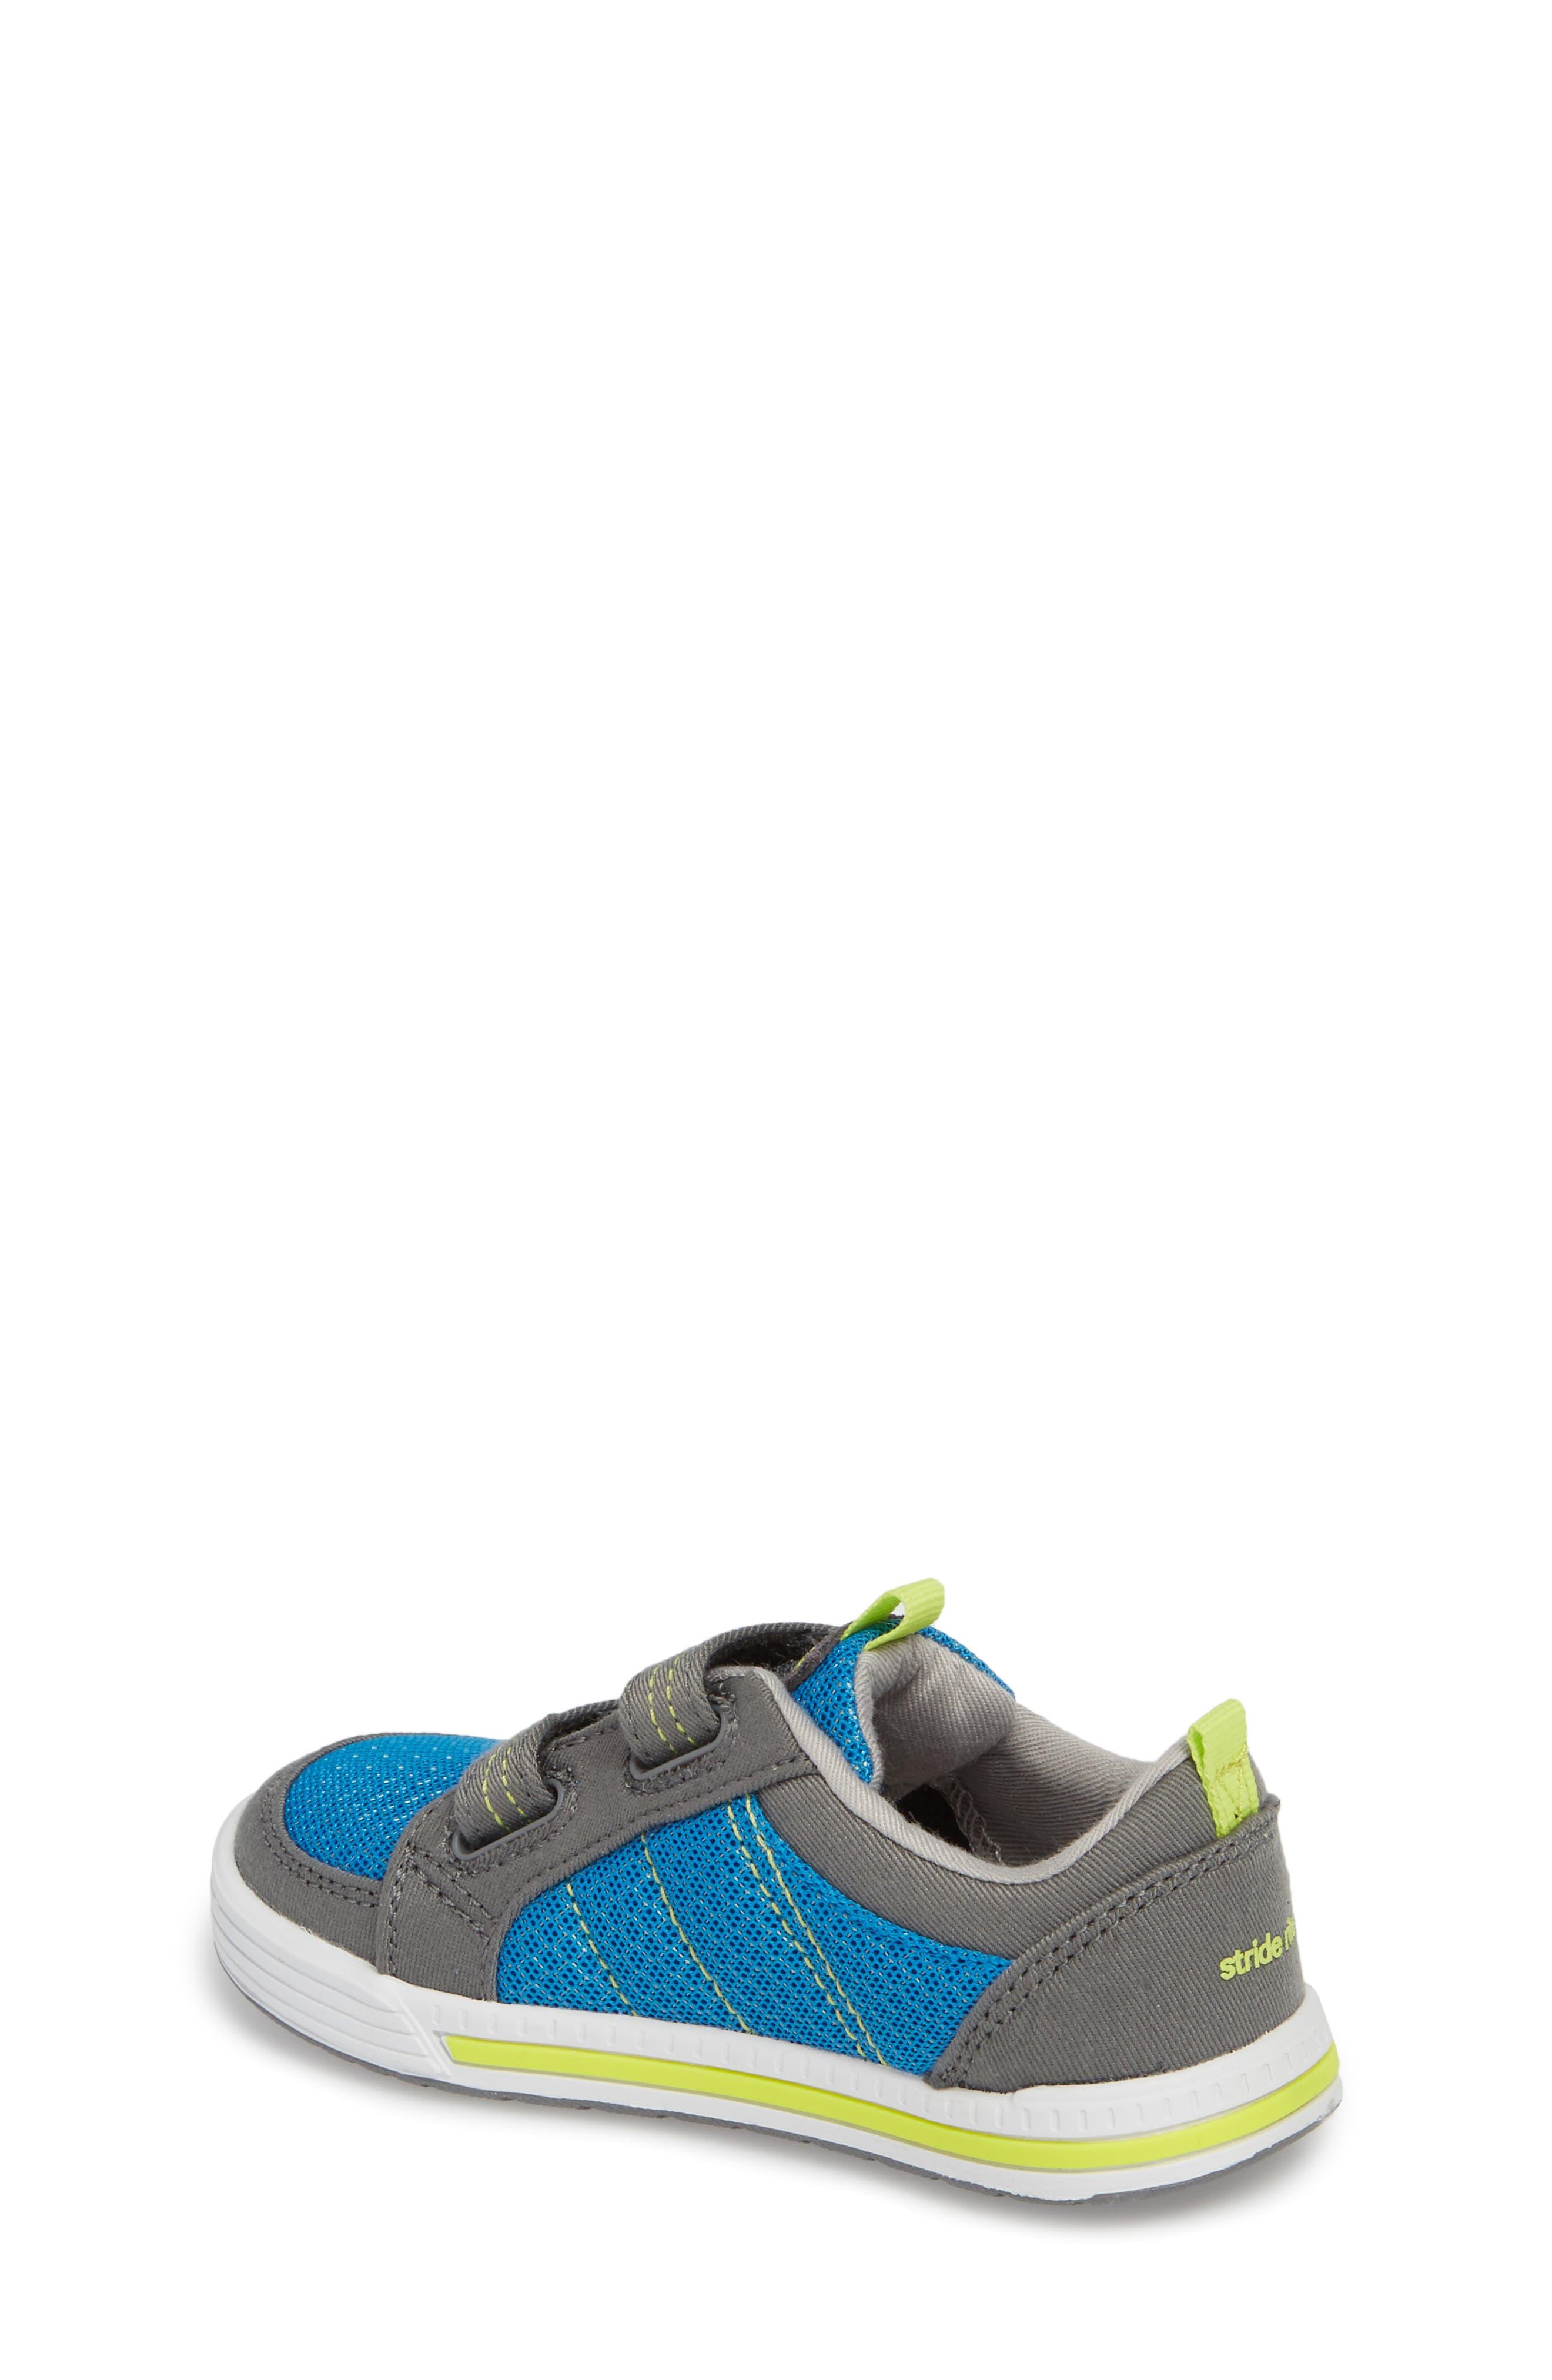 Logan Sneaker,                             Alternate thumbnail 2, color,                             Blue/ Grey